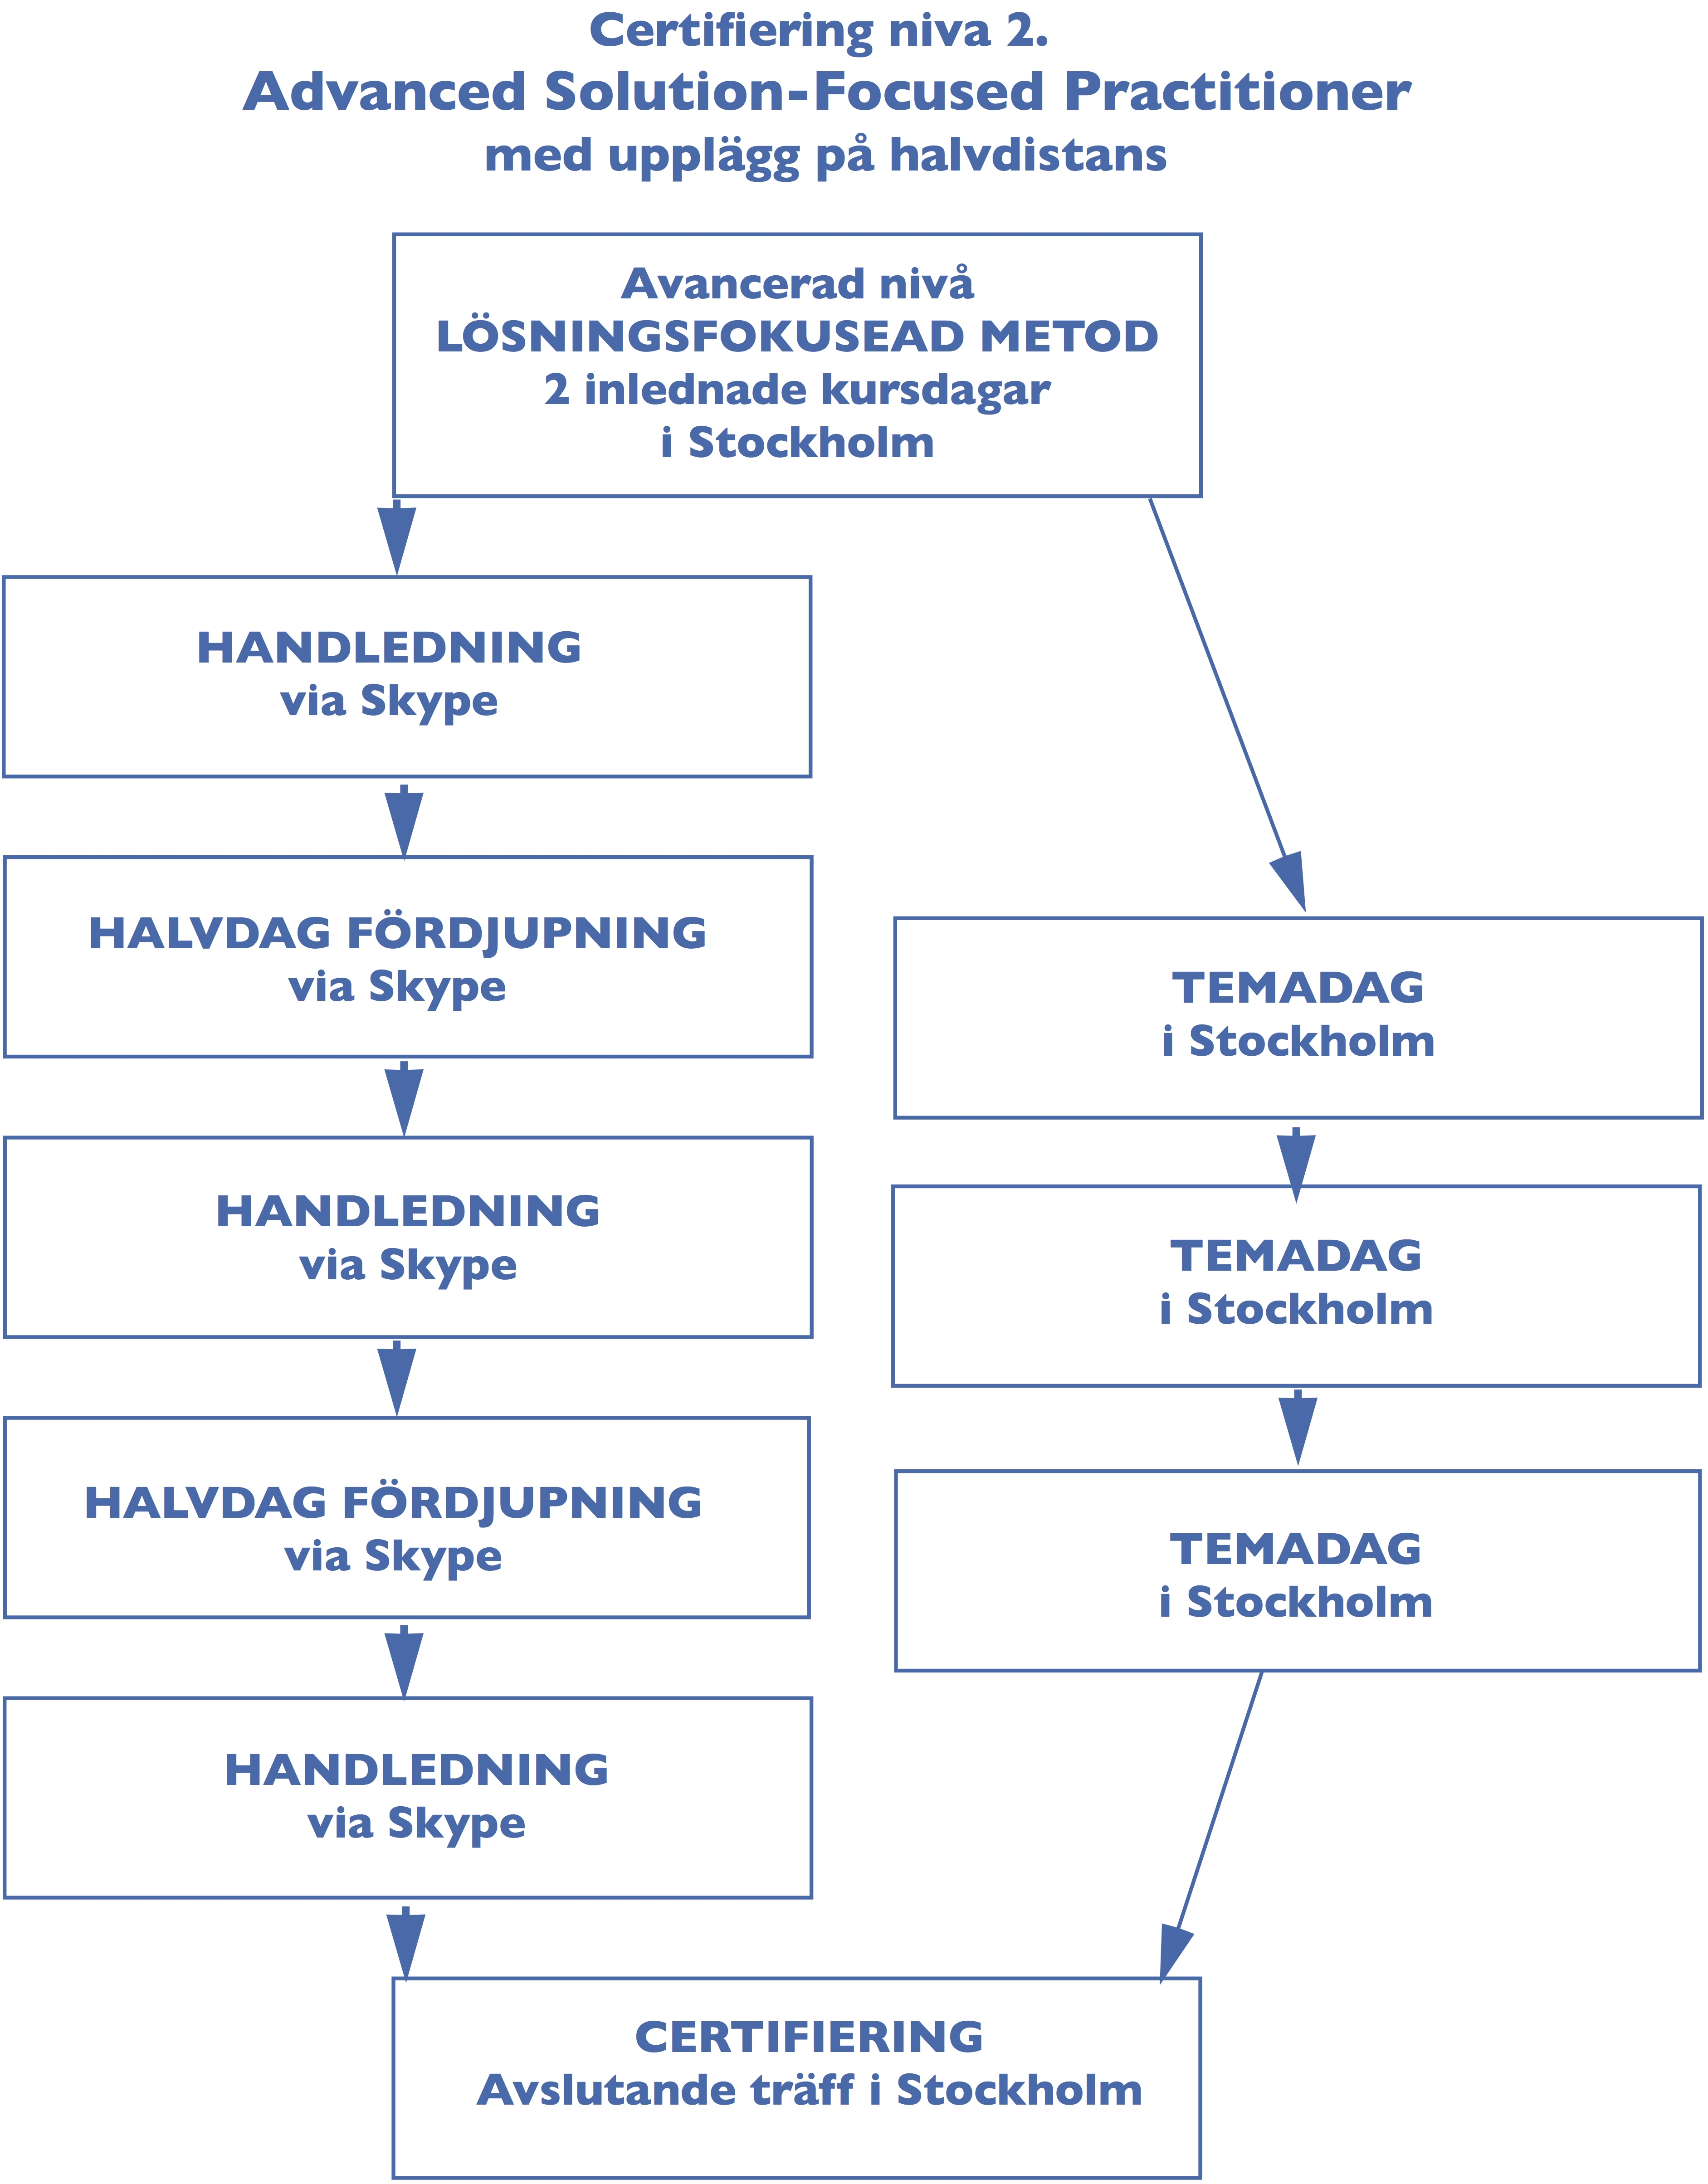 figNIV2-certifieringsprocess